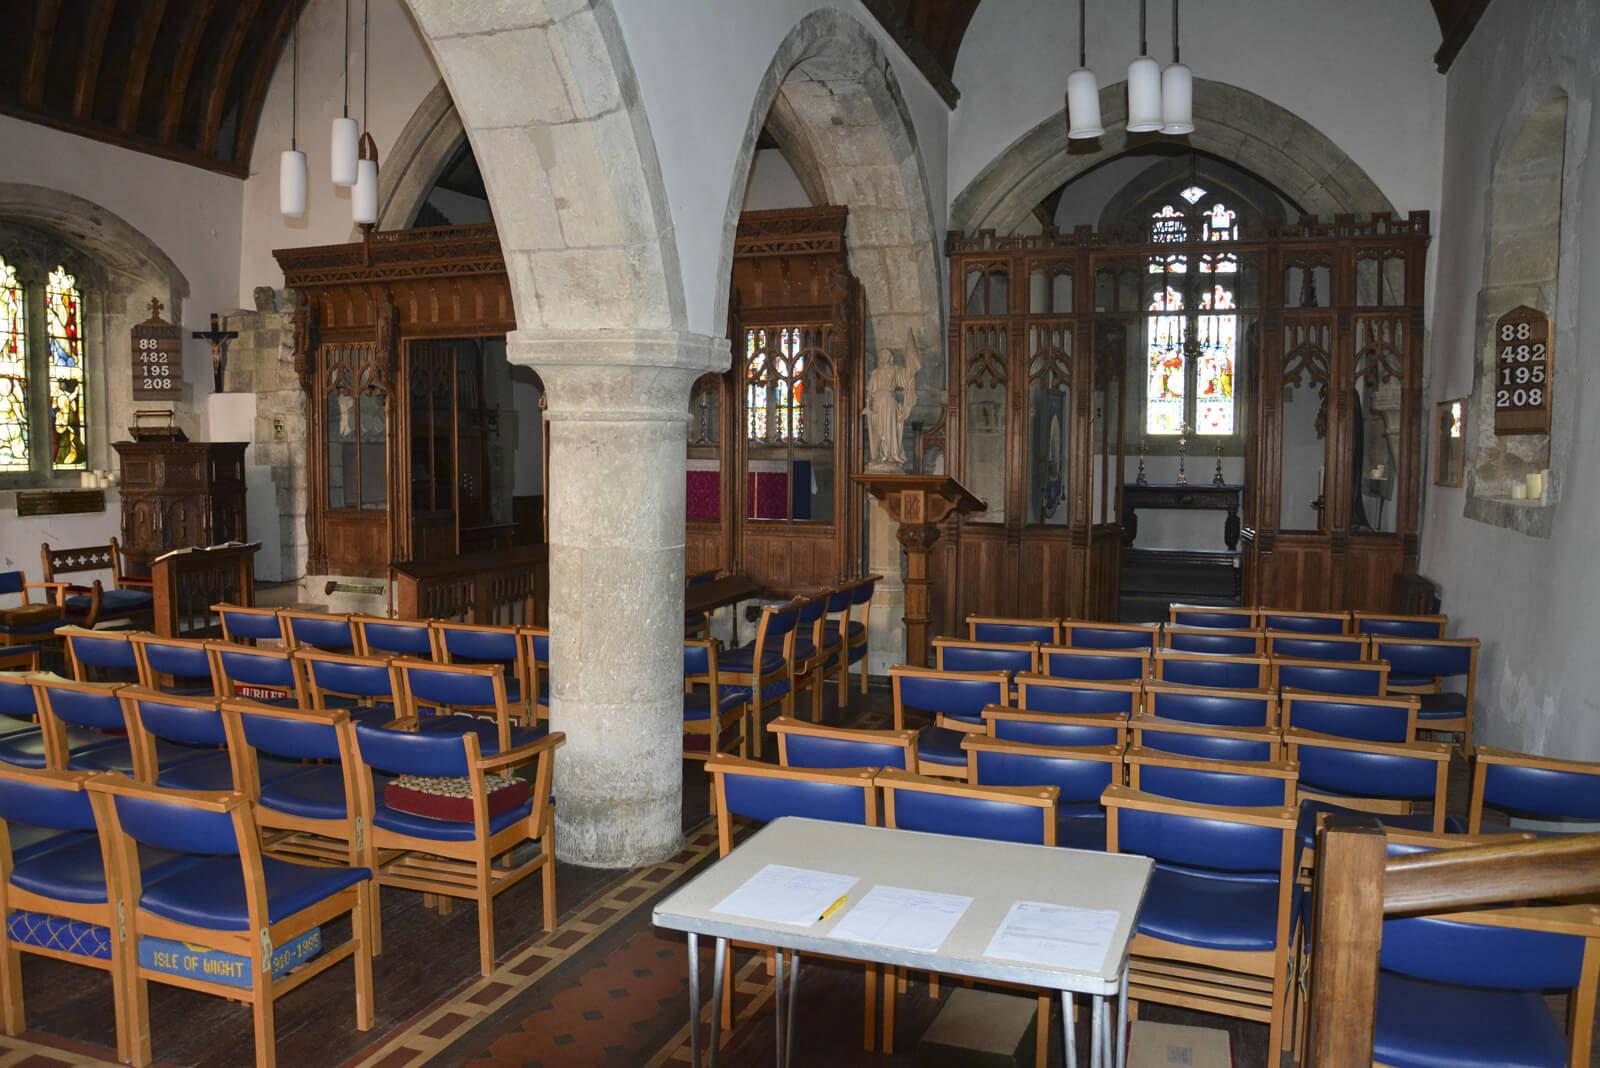 20150322 DSC_0553 Whitwell Church